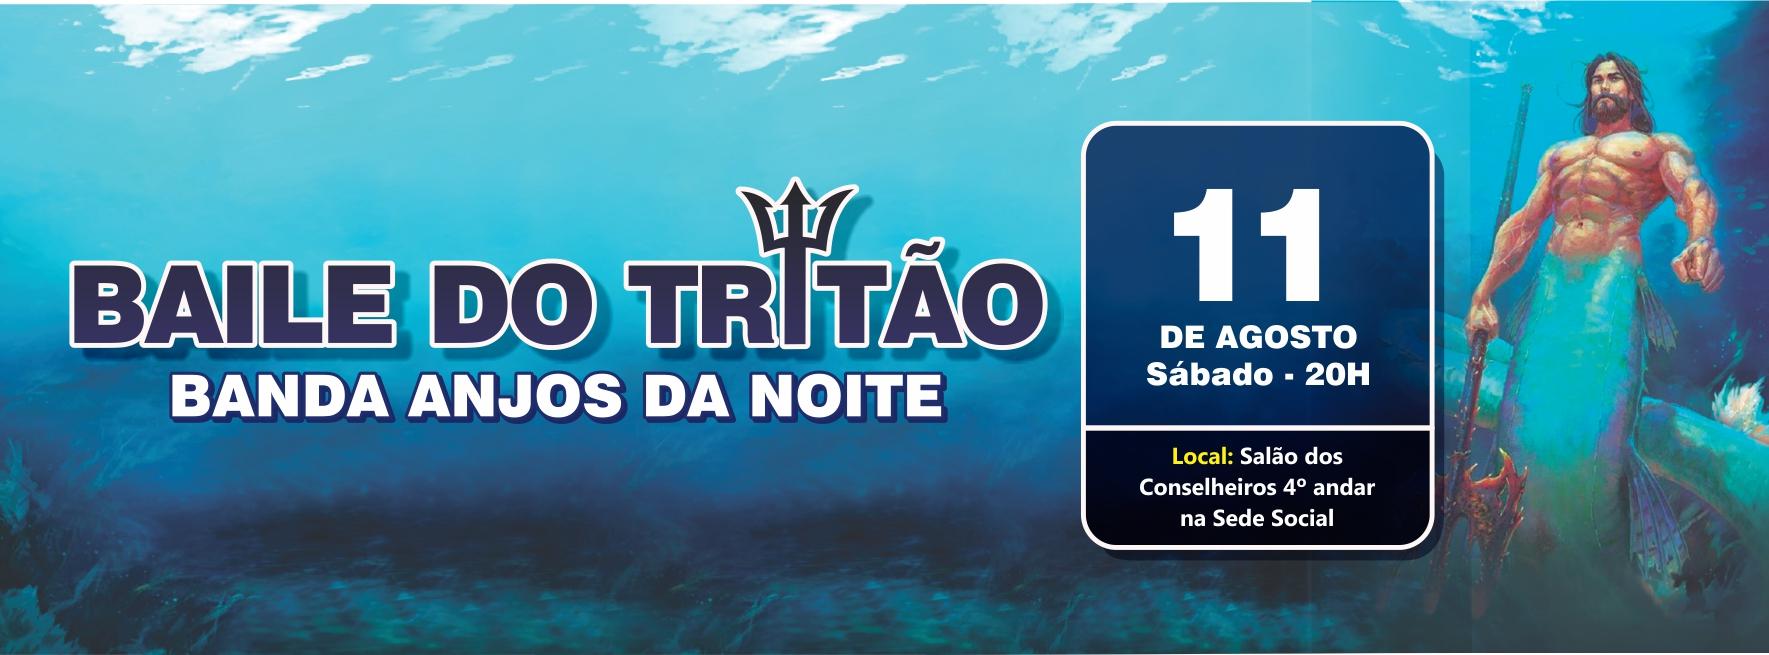 https://www.clubenaval.org.br/novo/baile-do-trit%C3%A3o